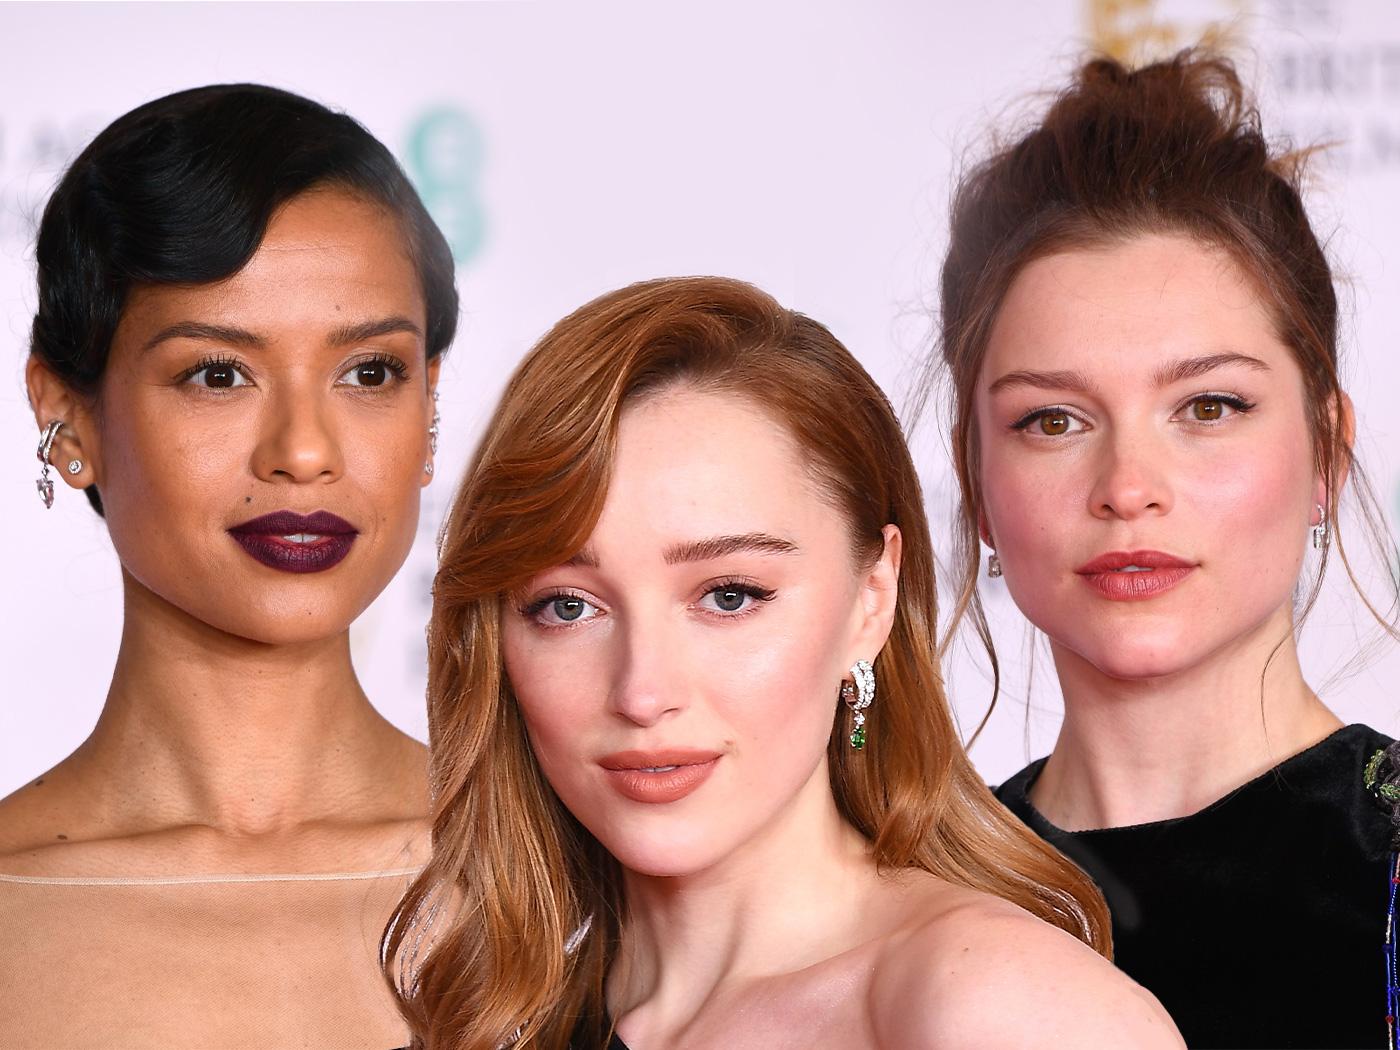 BAFTA Awards 2021: τα beauty looks που θέλουμε να αντιγράψουμε τώρα!